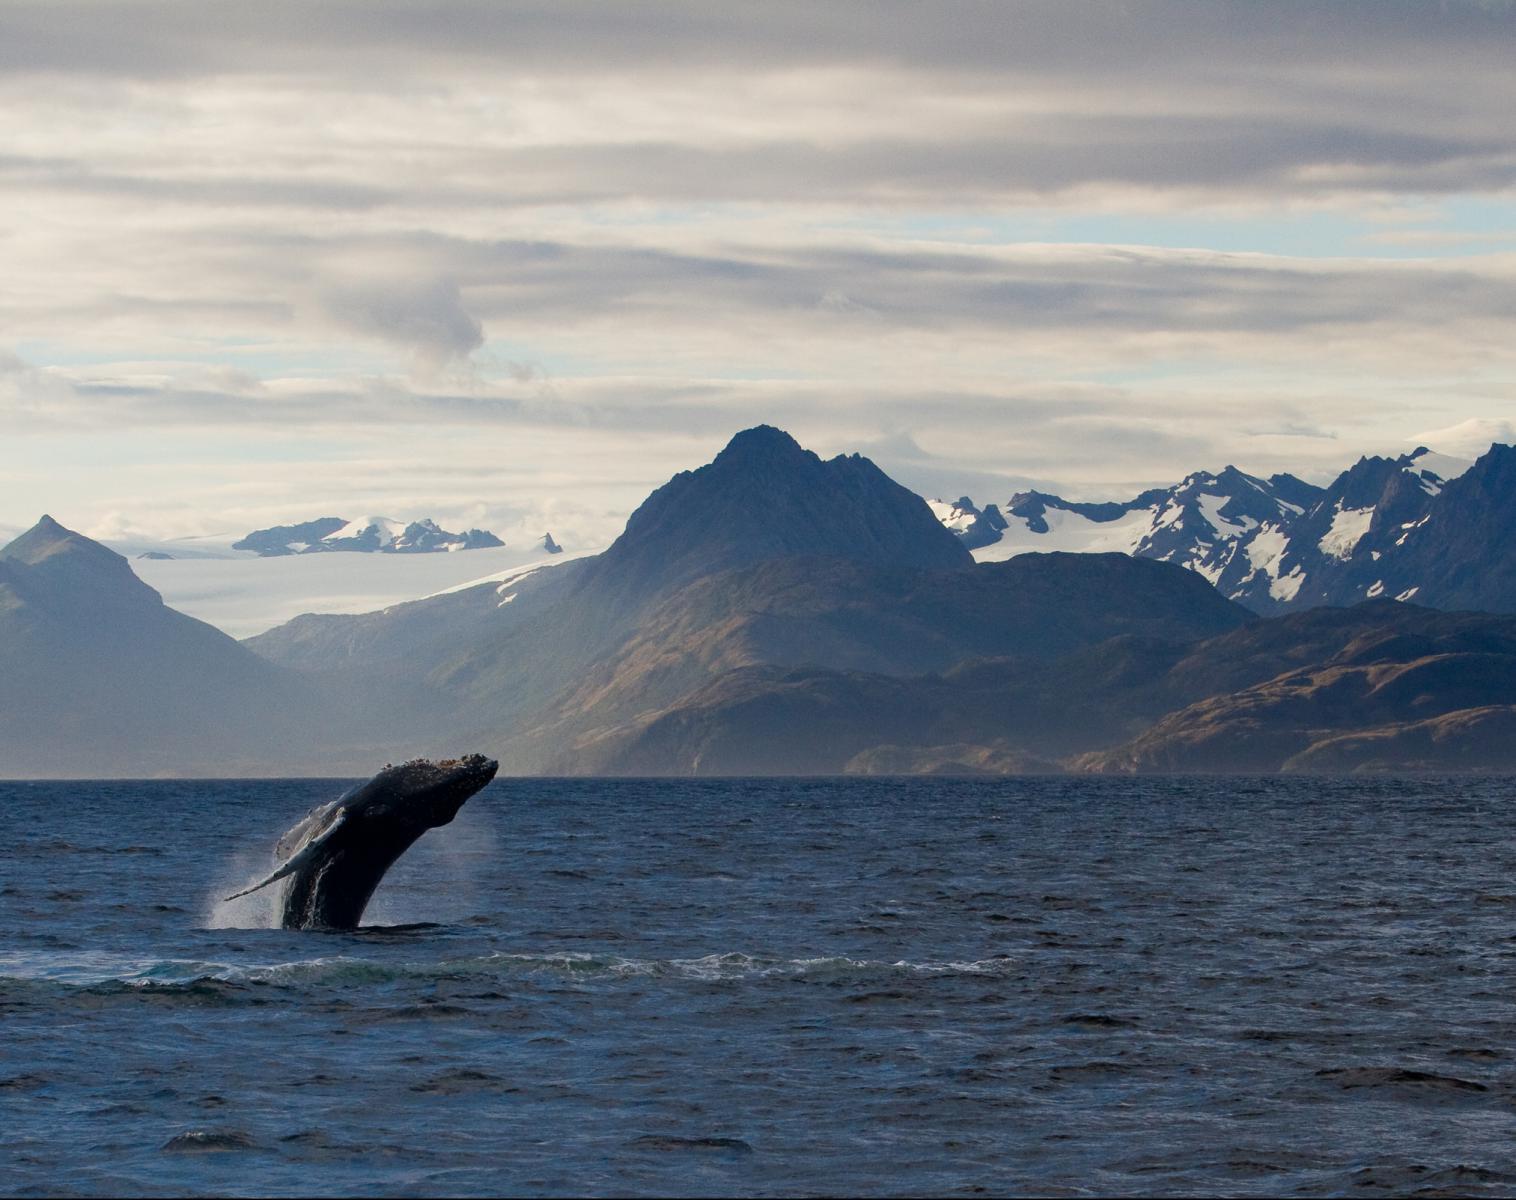 Patagonie  Mythique Patagonie, voyage naturaliste   Photo Observation nature Navigation